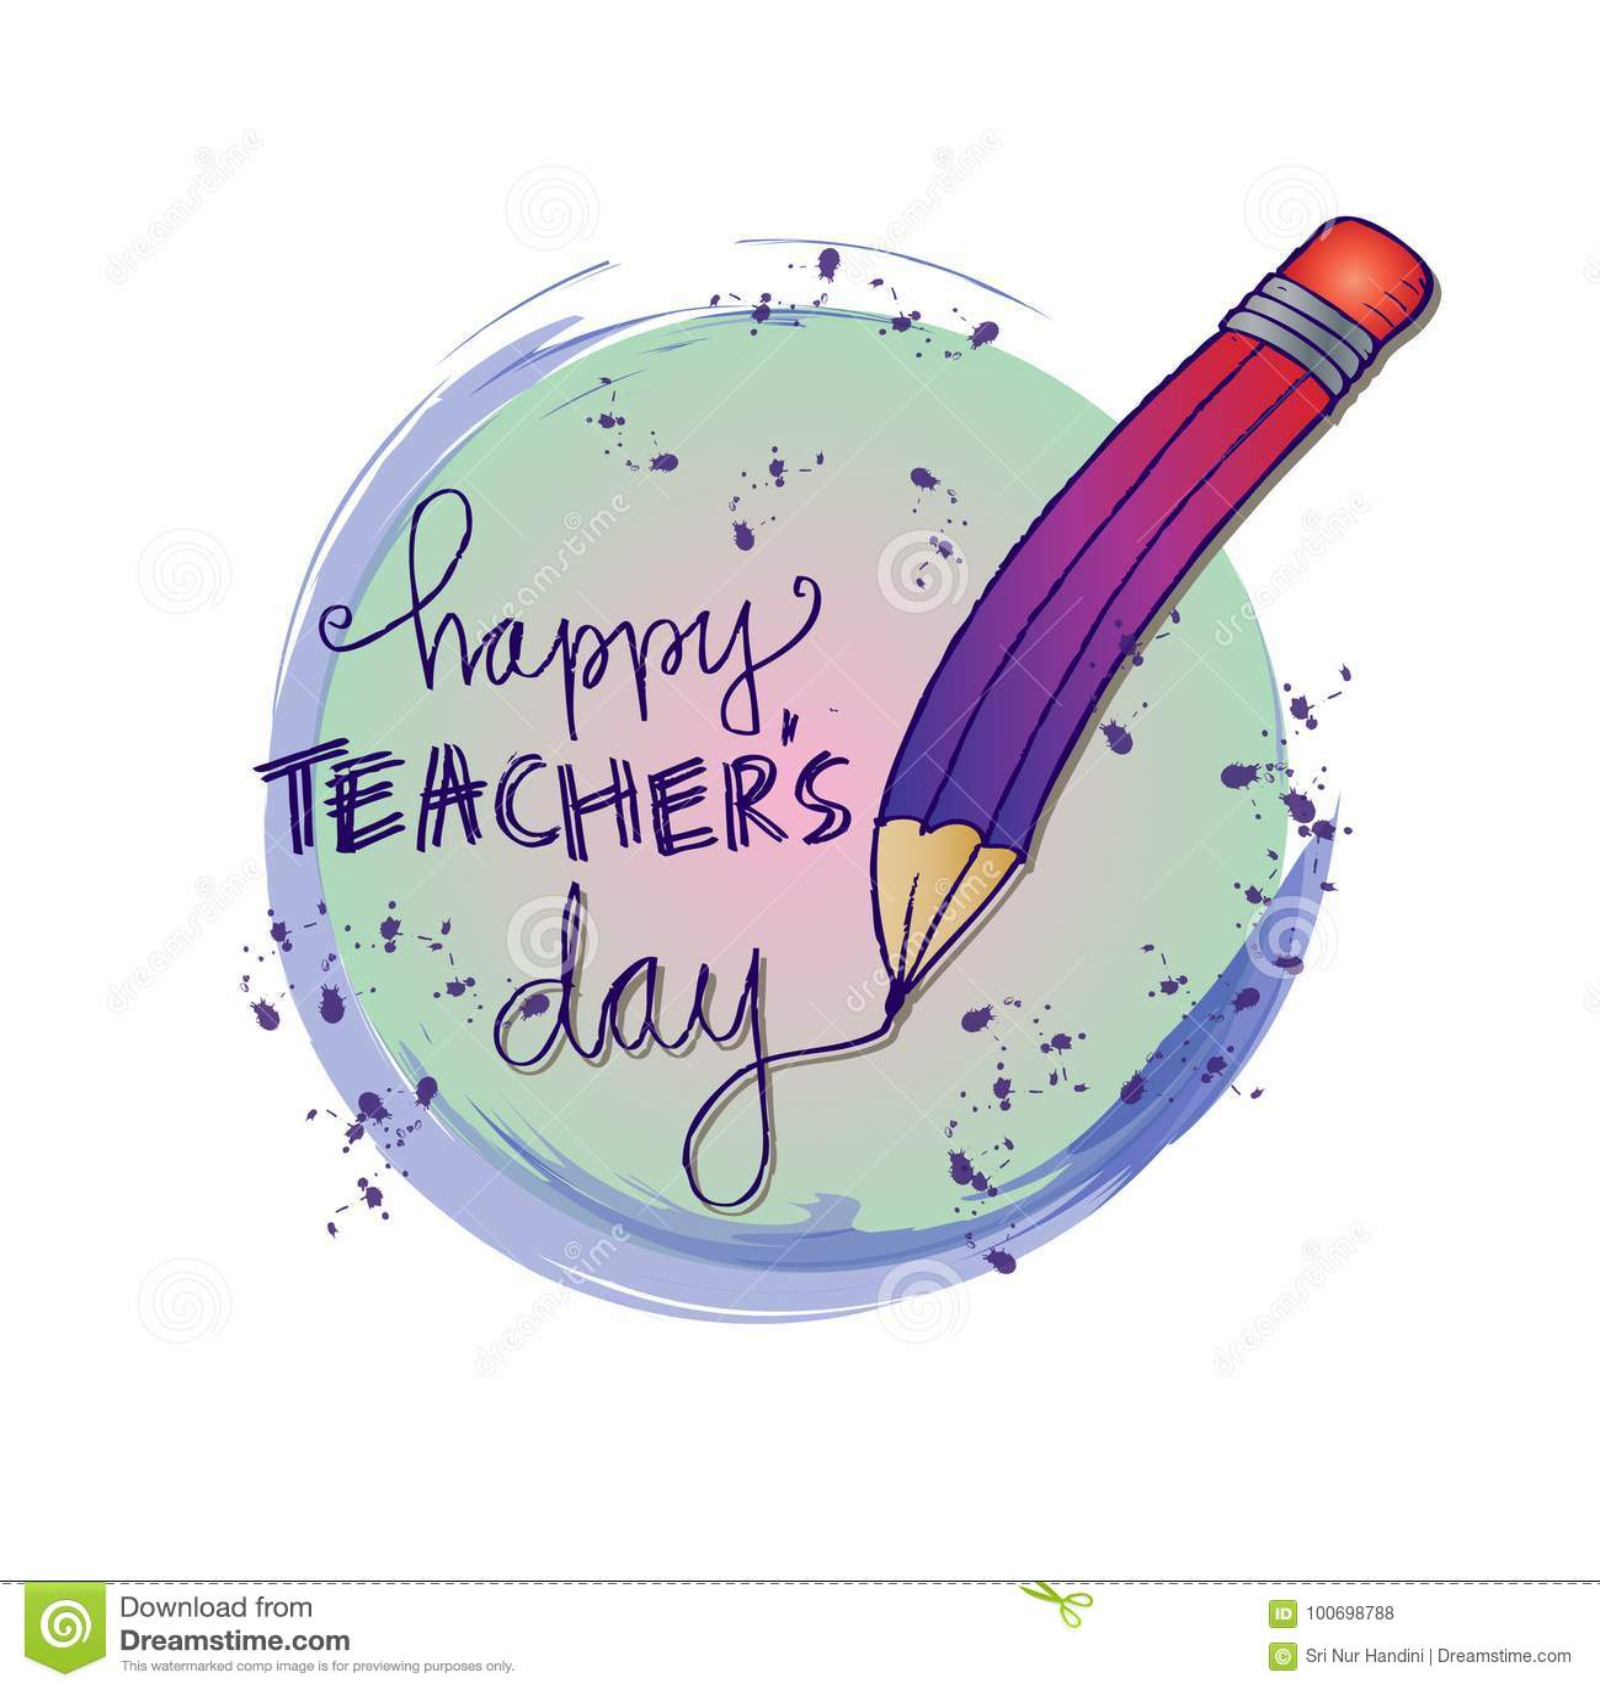 Happy teachers day card stock vector illustration of bubble